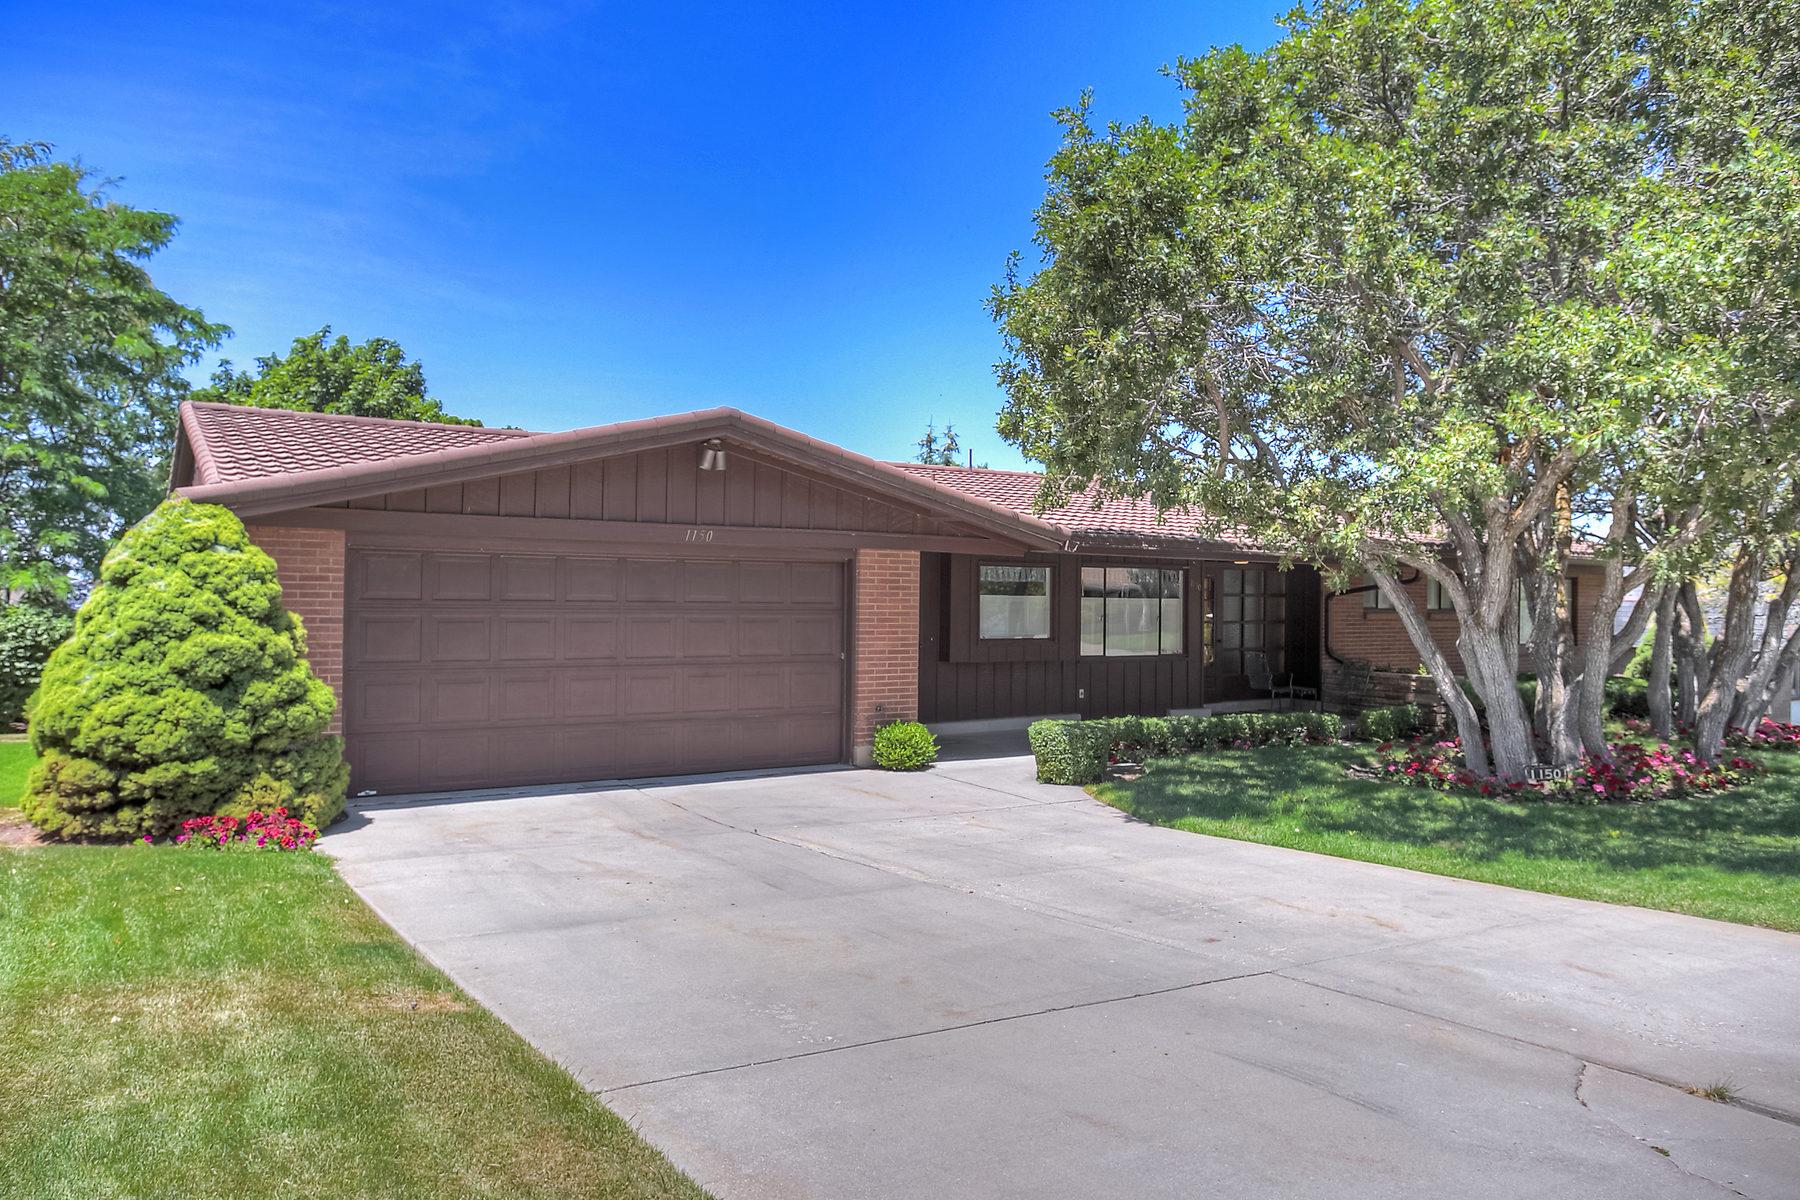 Villa per Vendita alle ore St. Mary's Rambler With Spectacular Bones 1150 S Mercedes Way Salt Lake City, Utah 84108 Stati Uniti